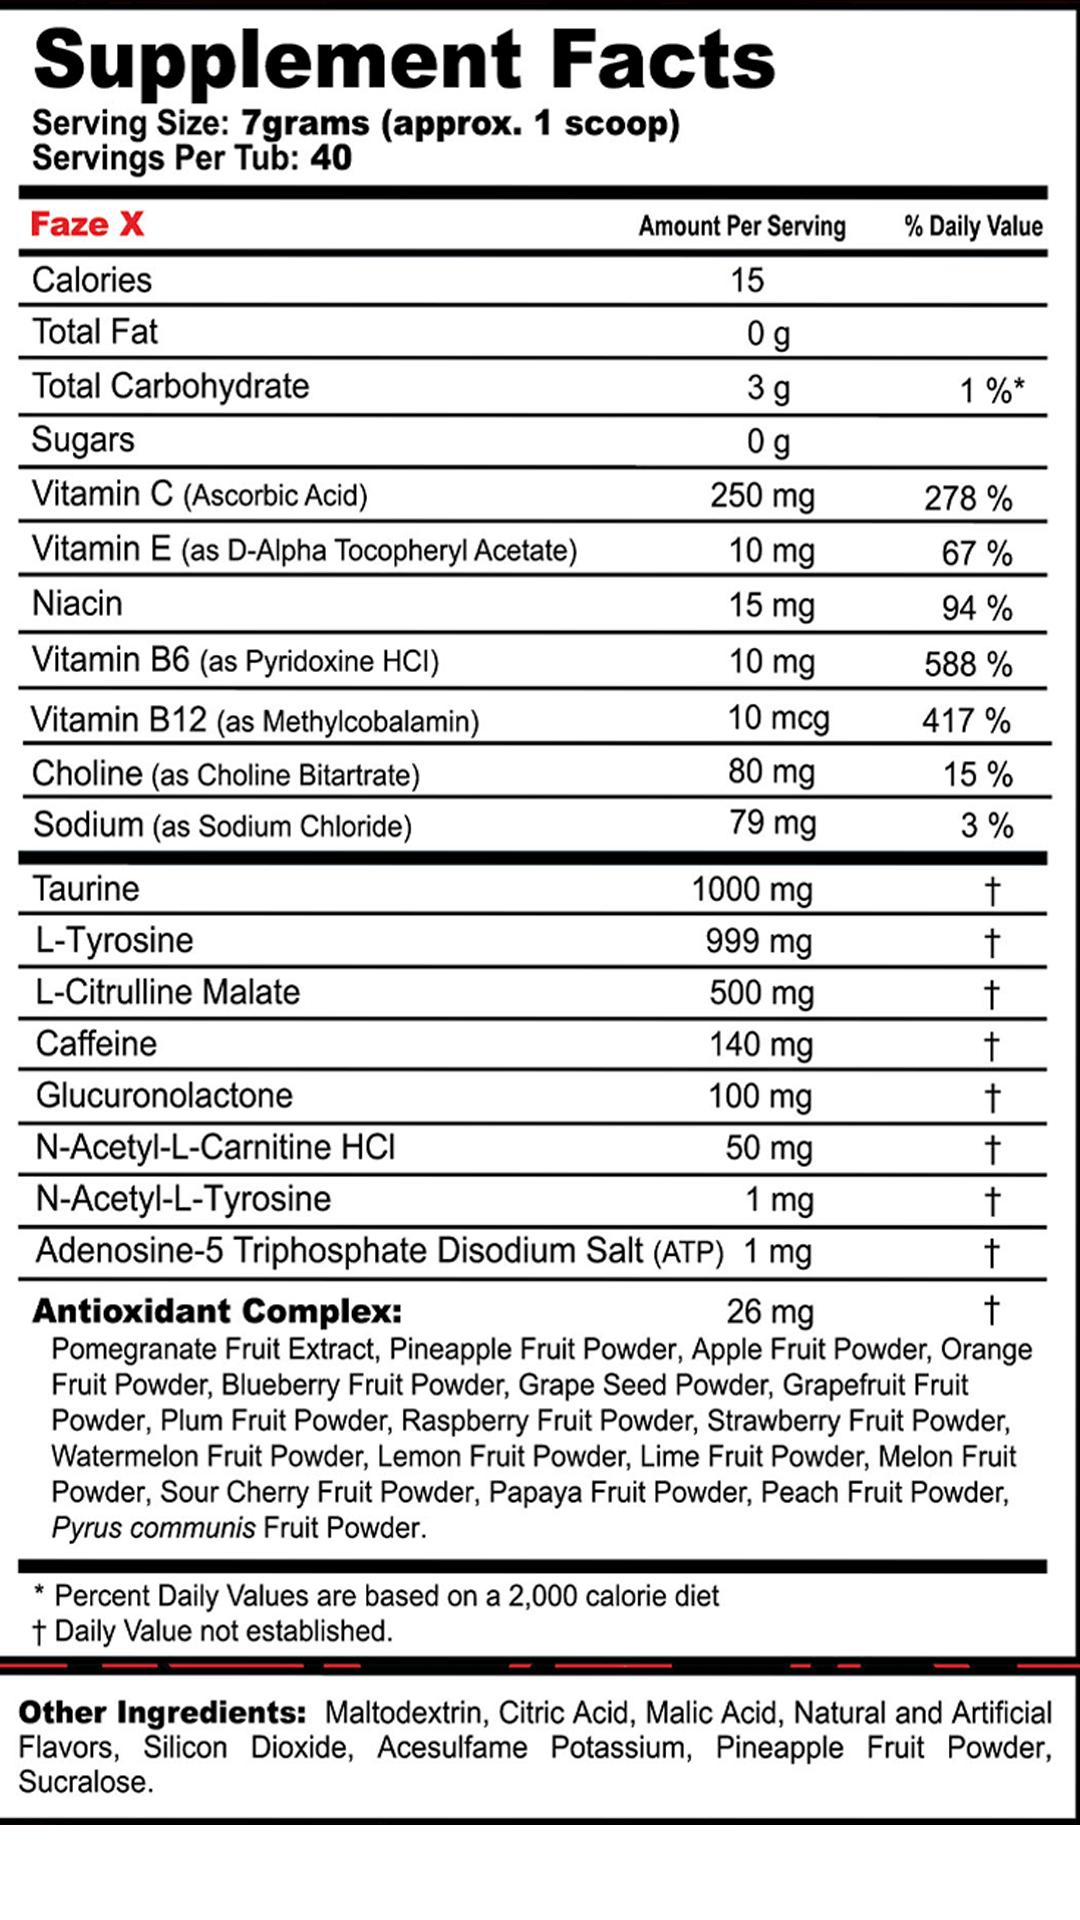 faze-x-fazeclan-anniversary-edition-nutrition-info-protein-pick-mix-uk.png